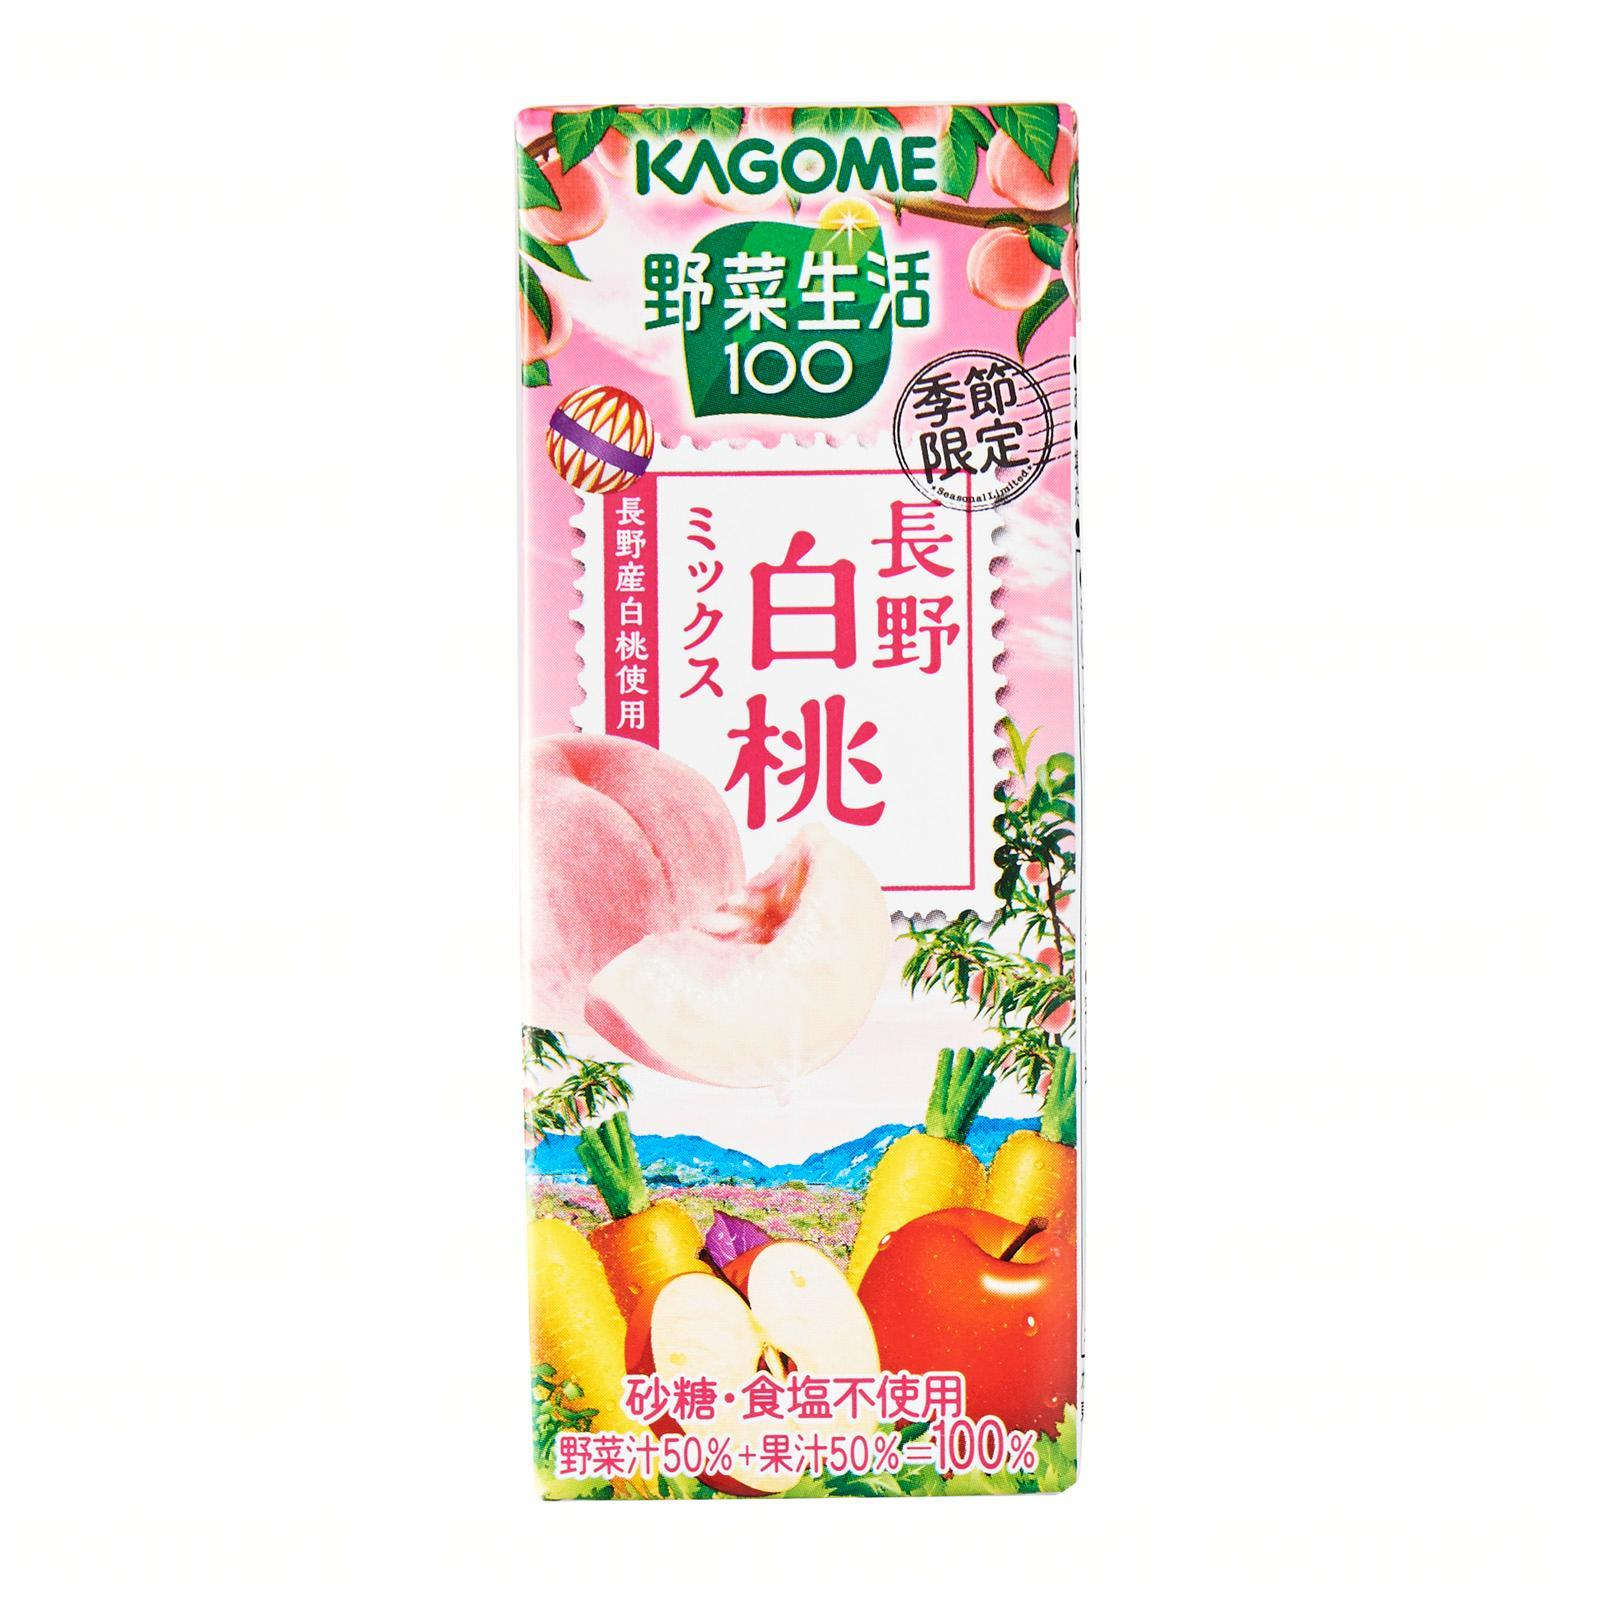 Kagome Seasonal Nagano Peach Juice By Redmart.